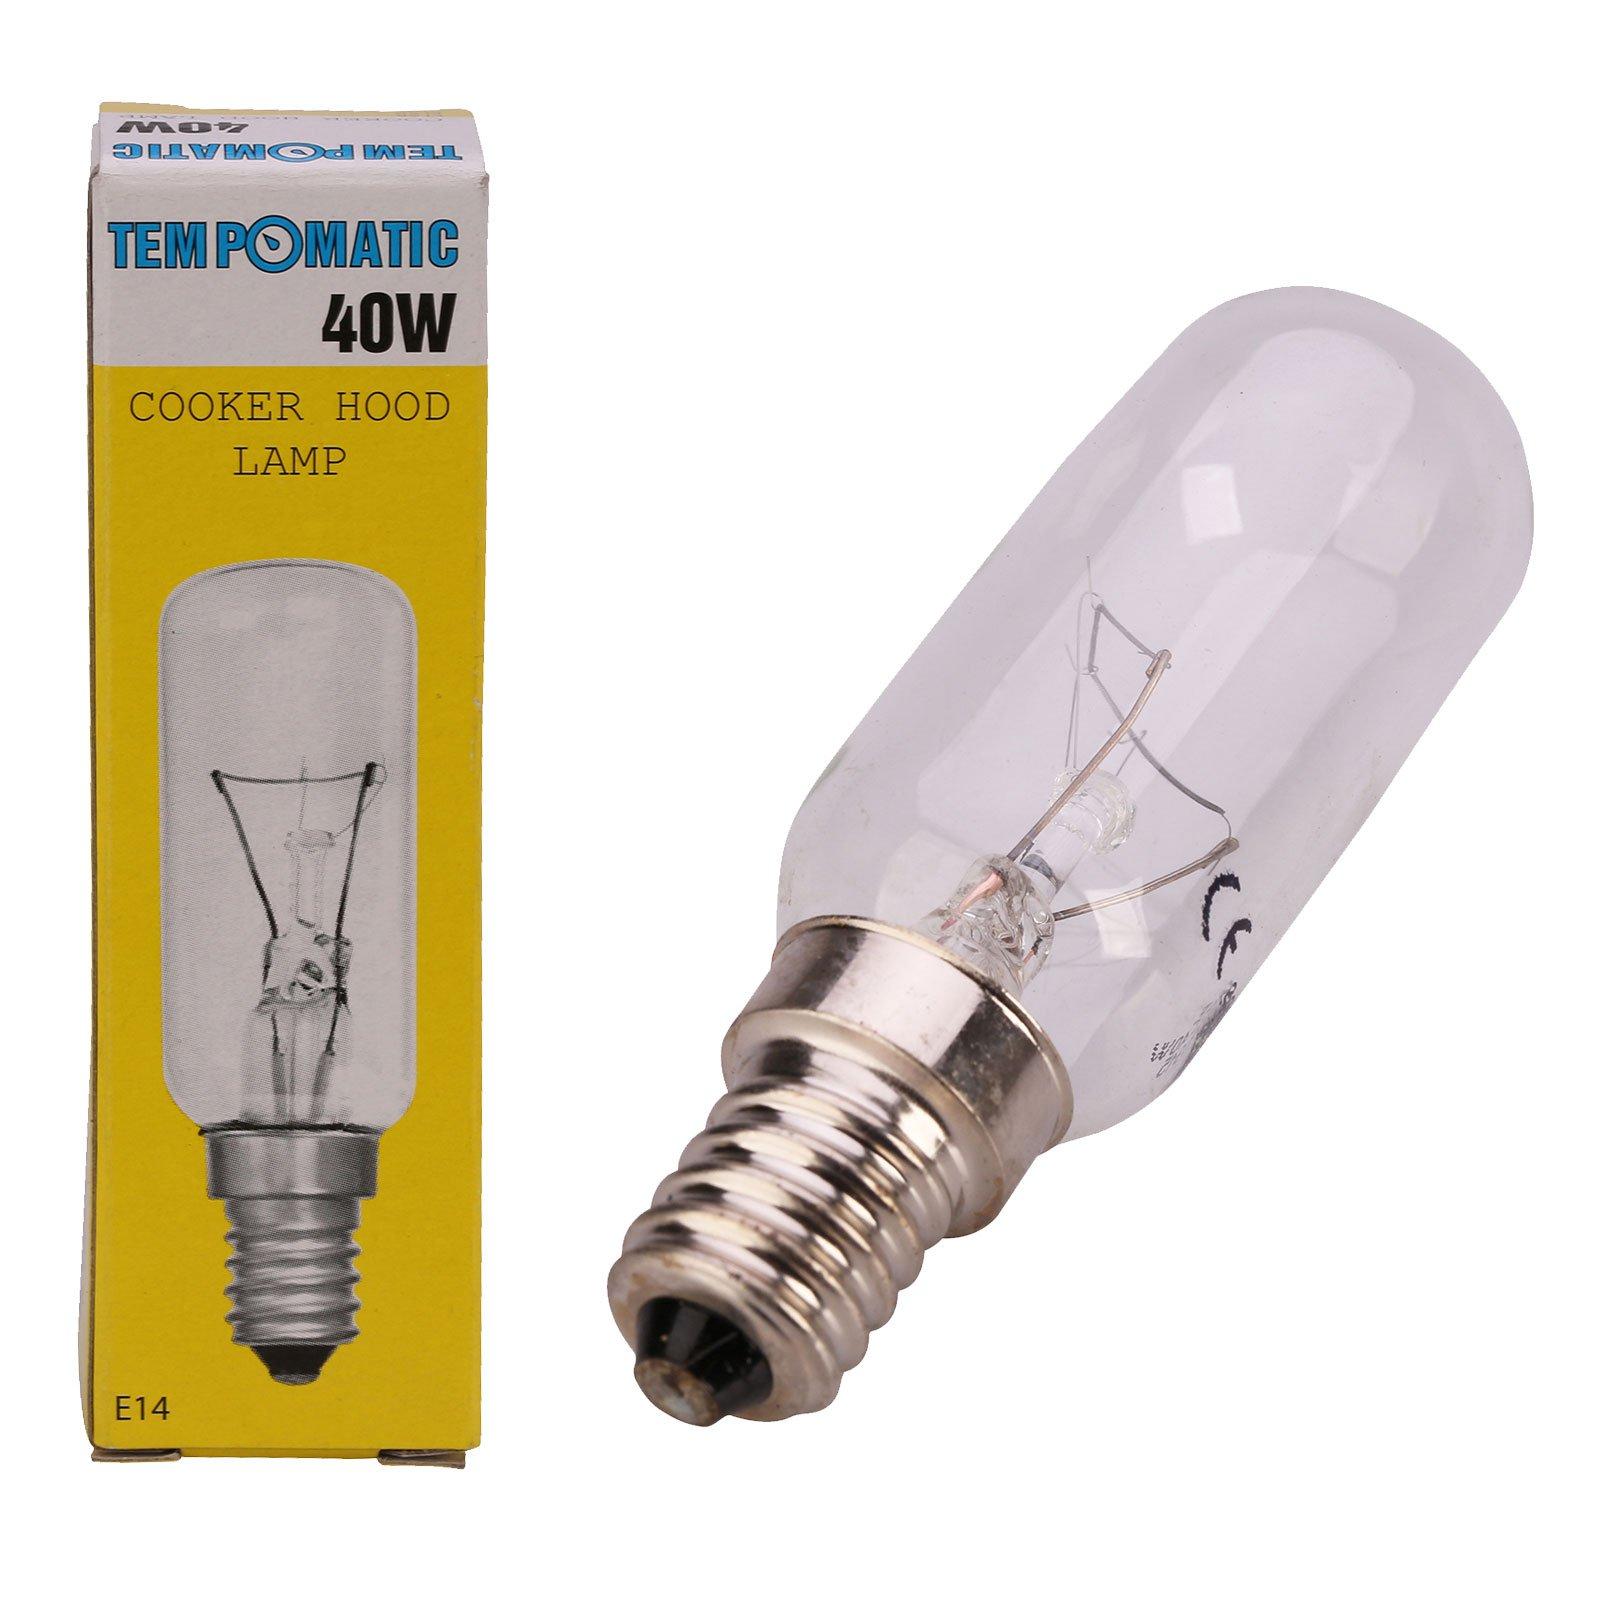 Qualtex E14 40W SES - Bombilla para campana extractora 1 pack transparente: Amazon.es: Grandes electrodomésticos